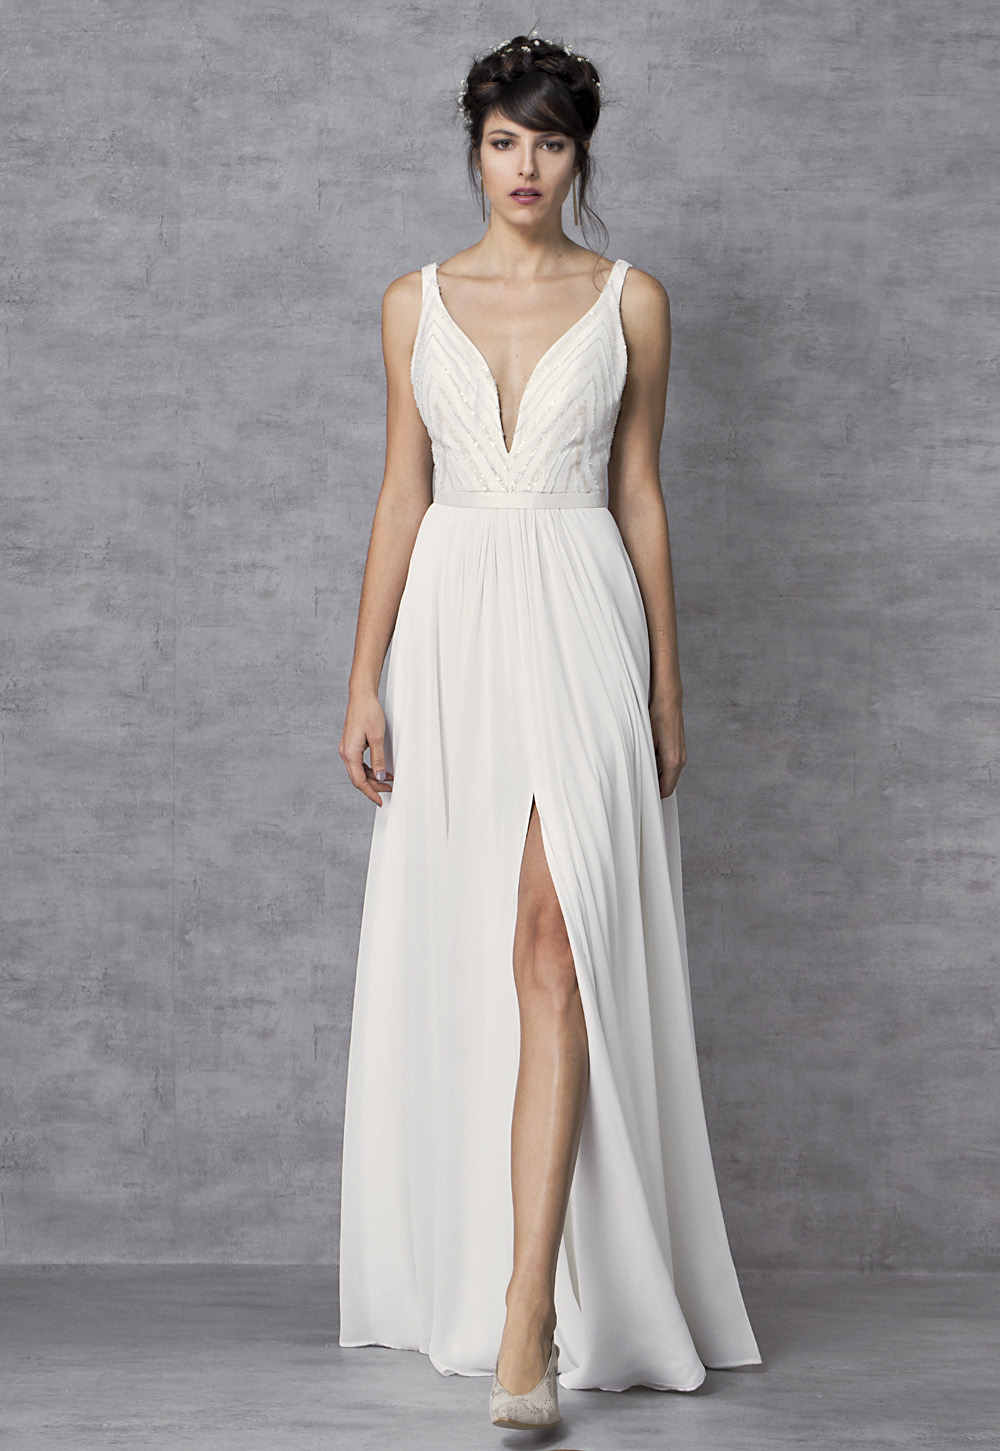 I3A9037 שמלות כלה - שמלה